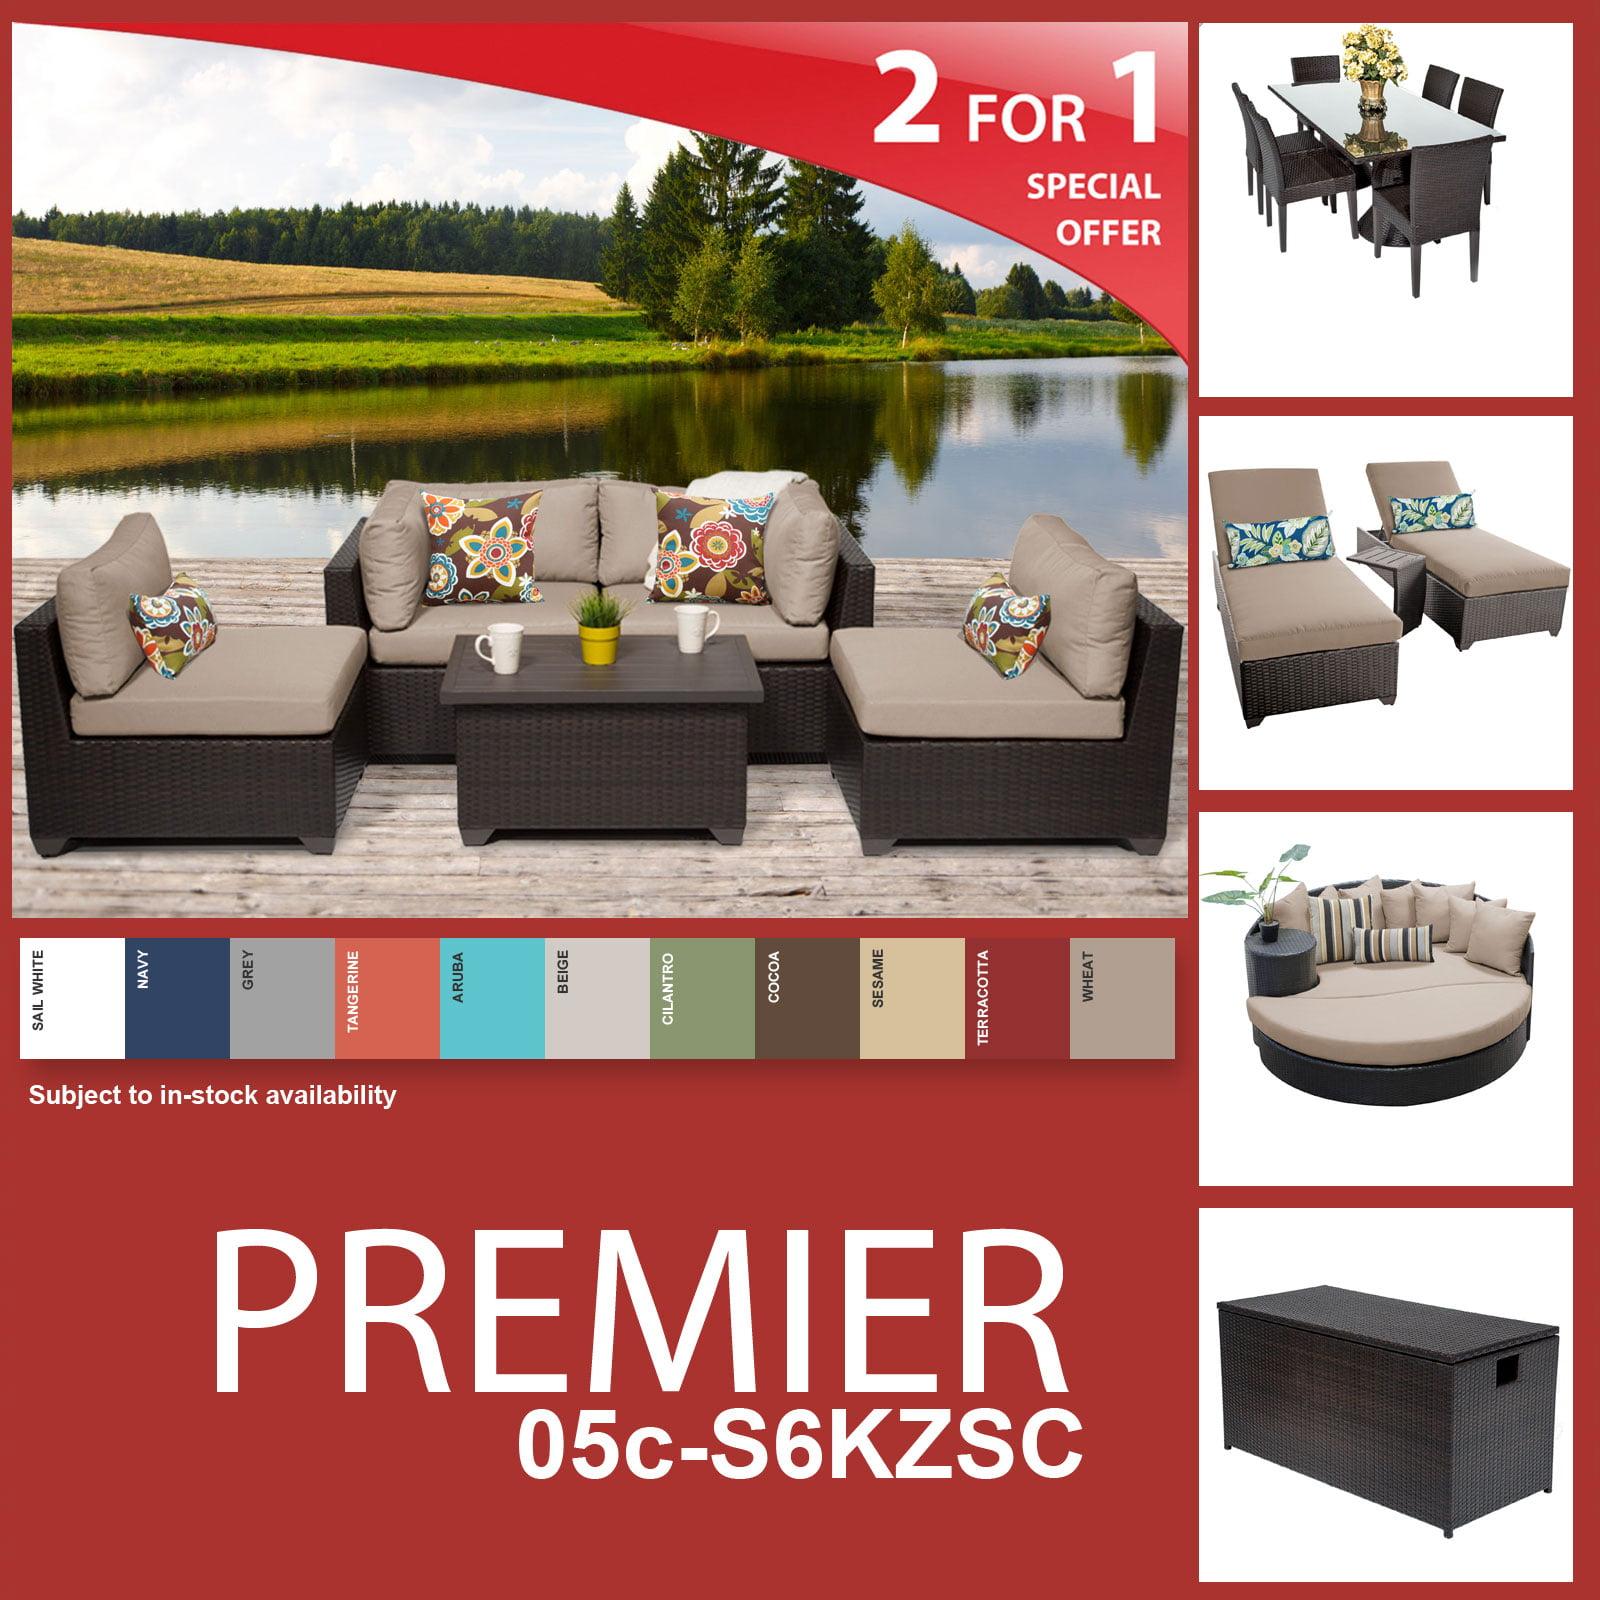 Premier 18 Piece Outdoor Wicker Patio Furniture Package PREMIER-05c-S6KZSC